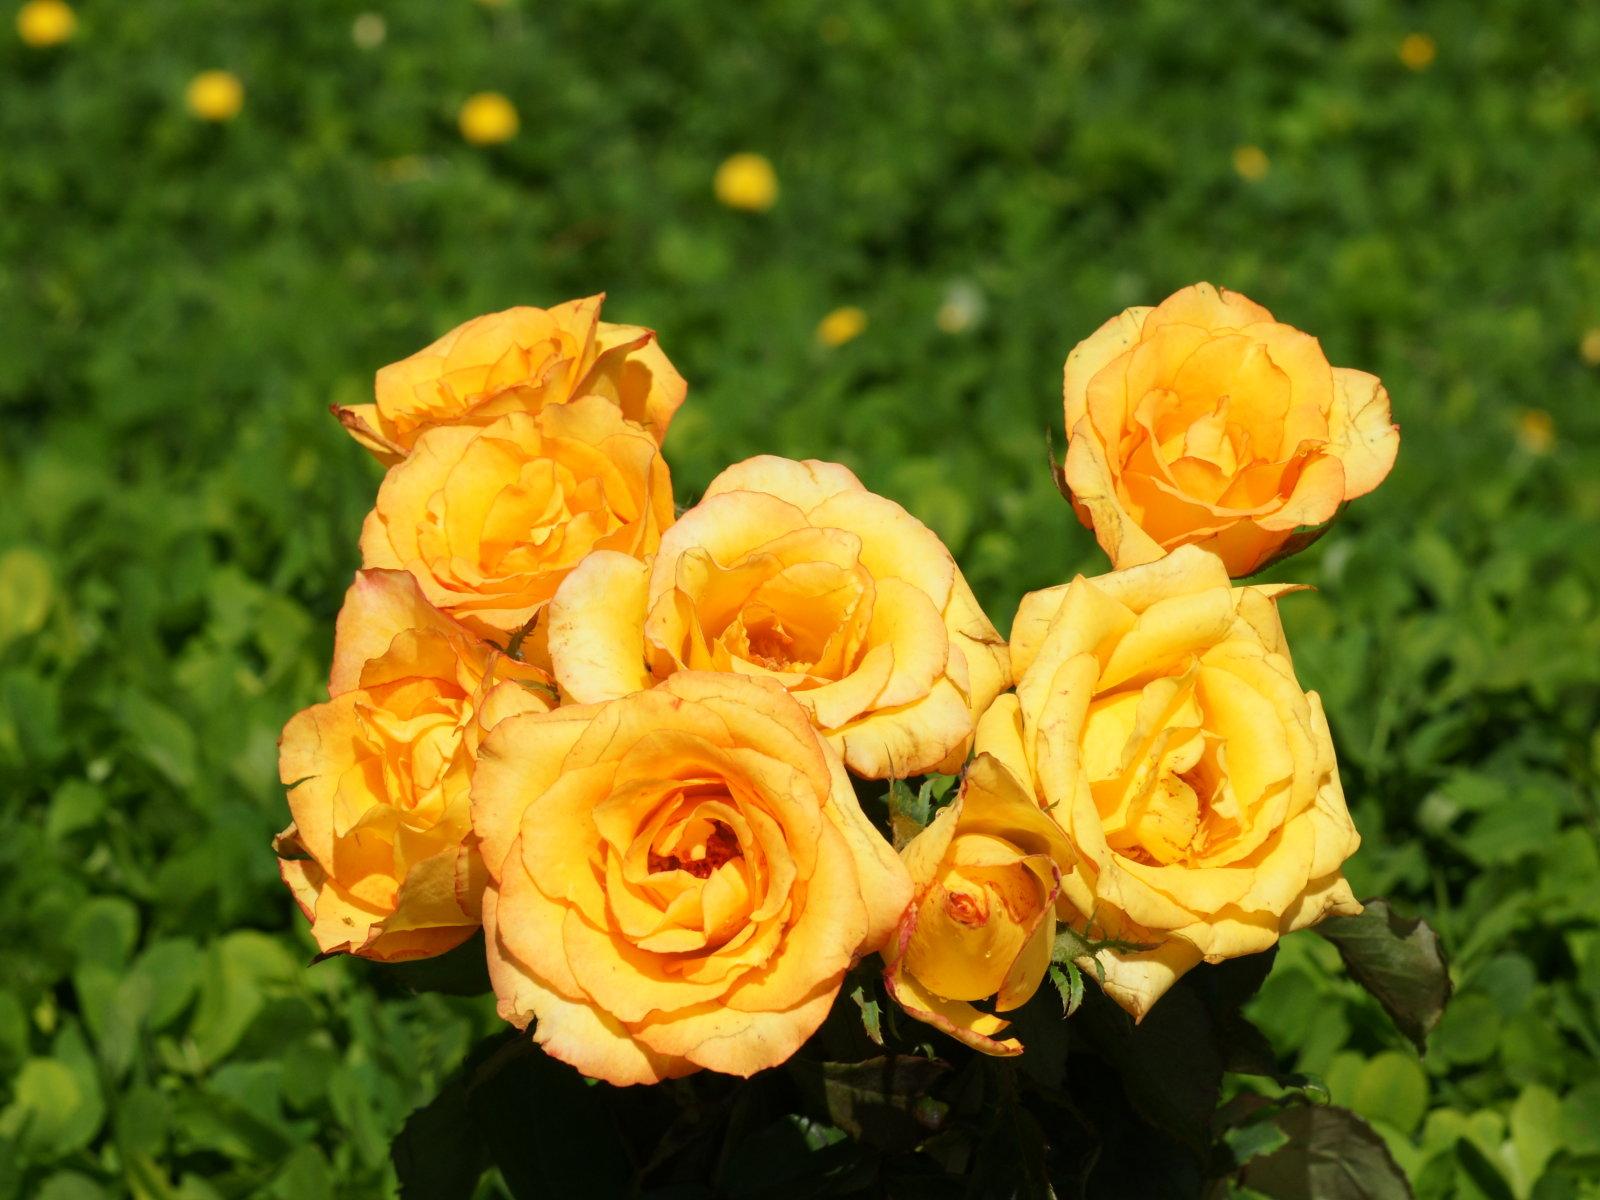 Rose Wallpaper Yellow Rose HD Wallpaper Download Free